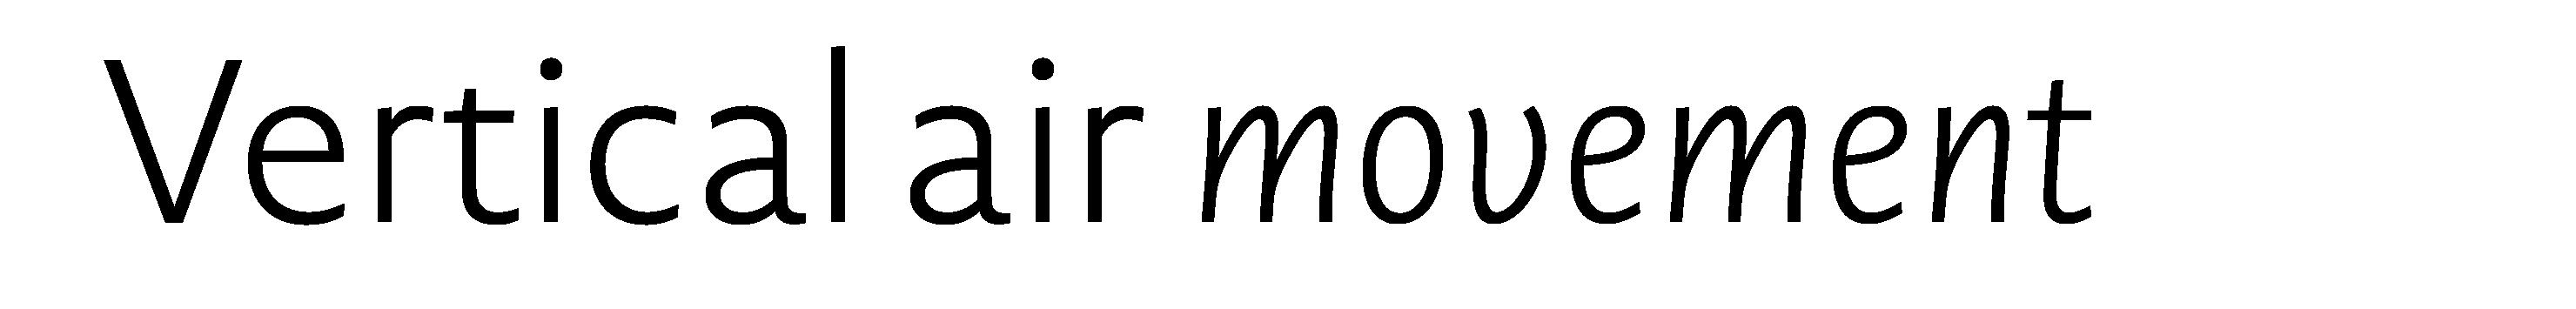 Typeface Novel Sans D01 Atlas Font Foundry